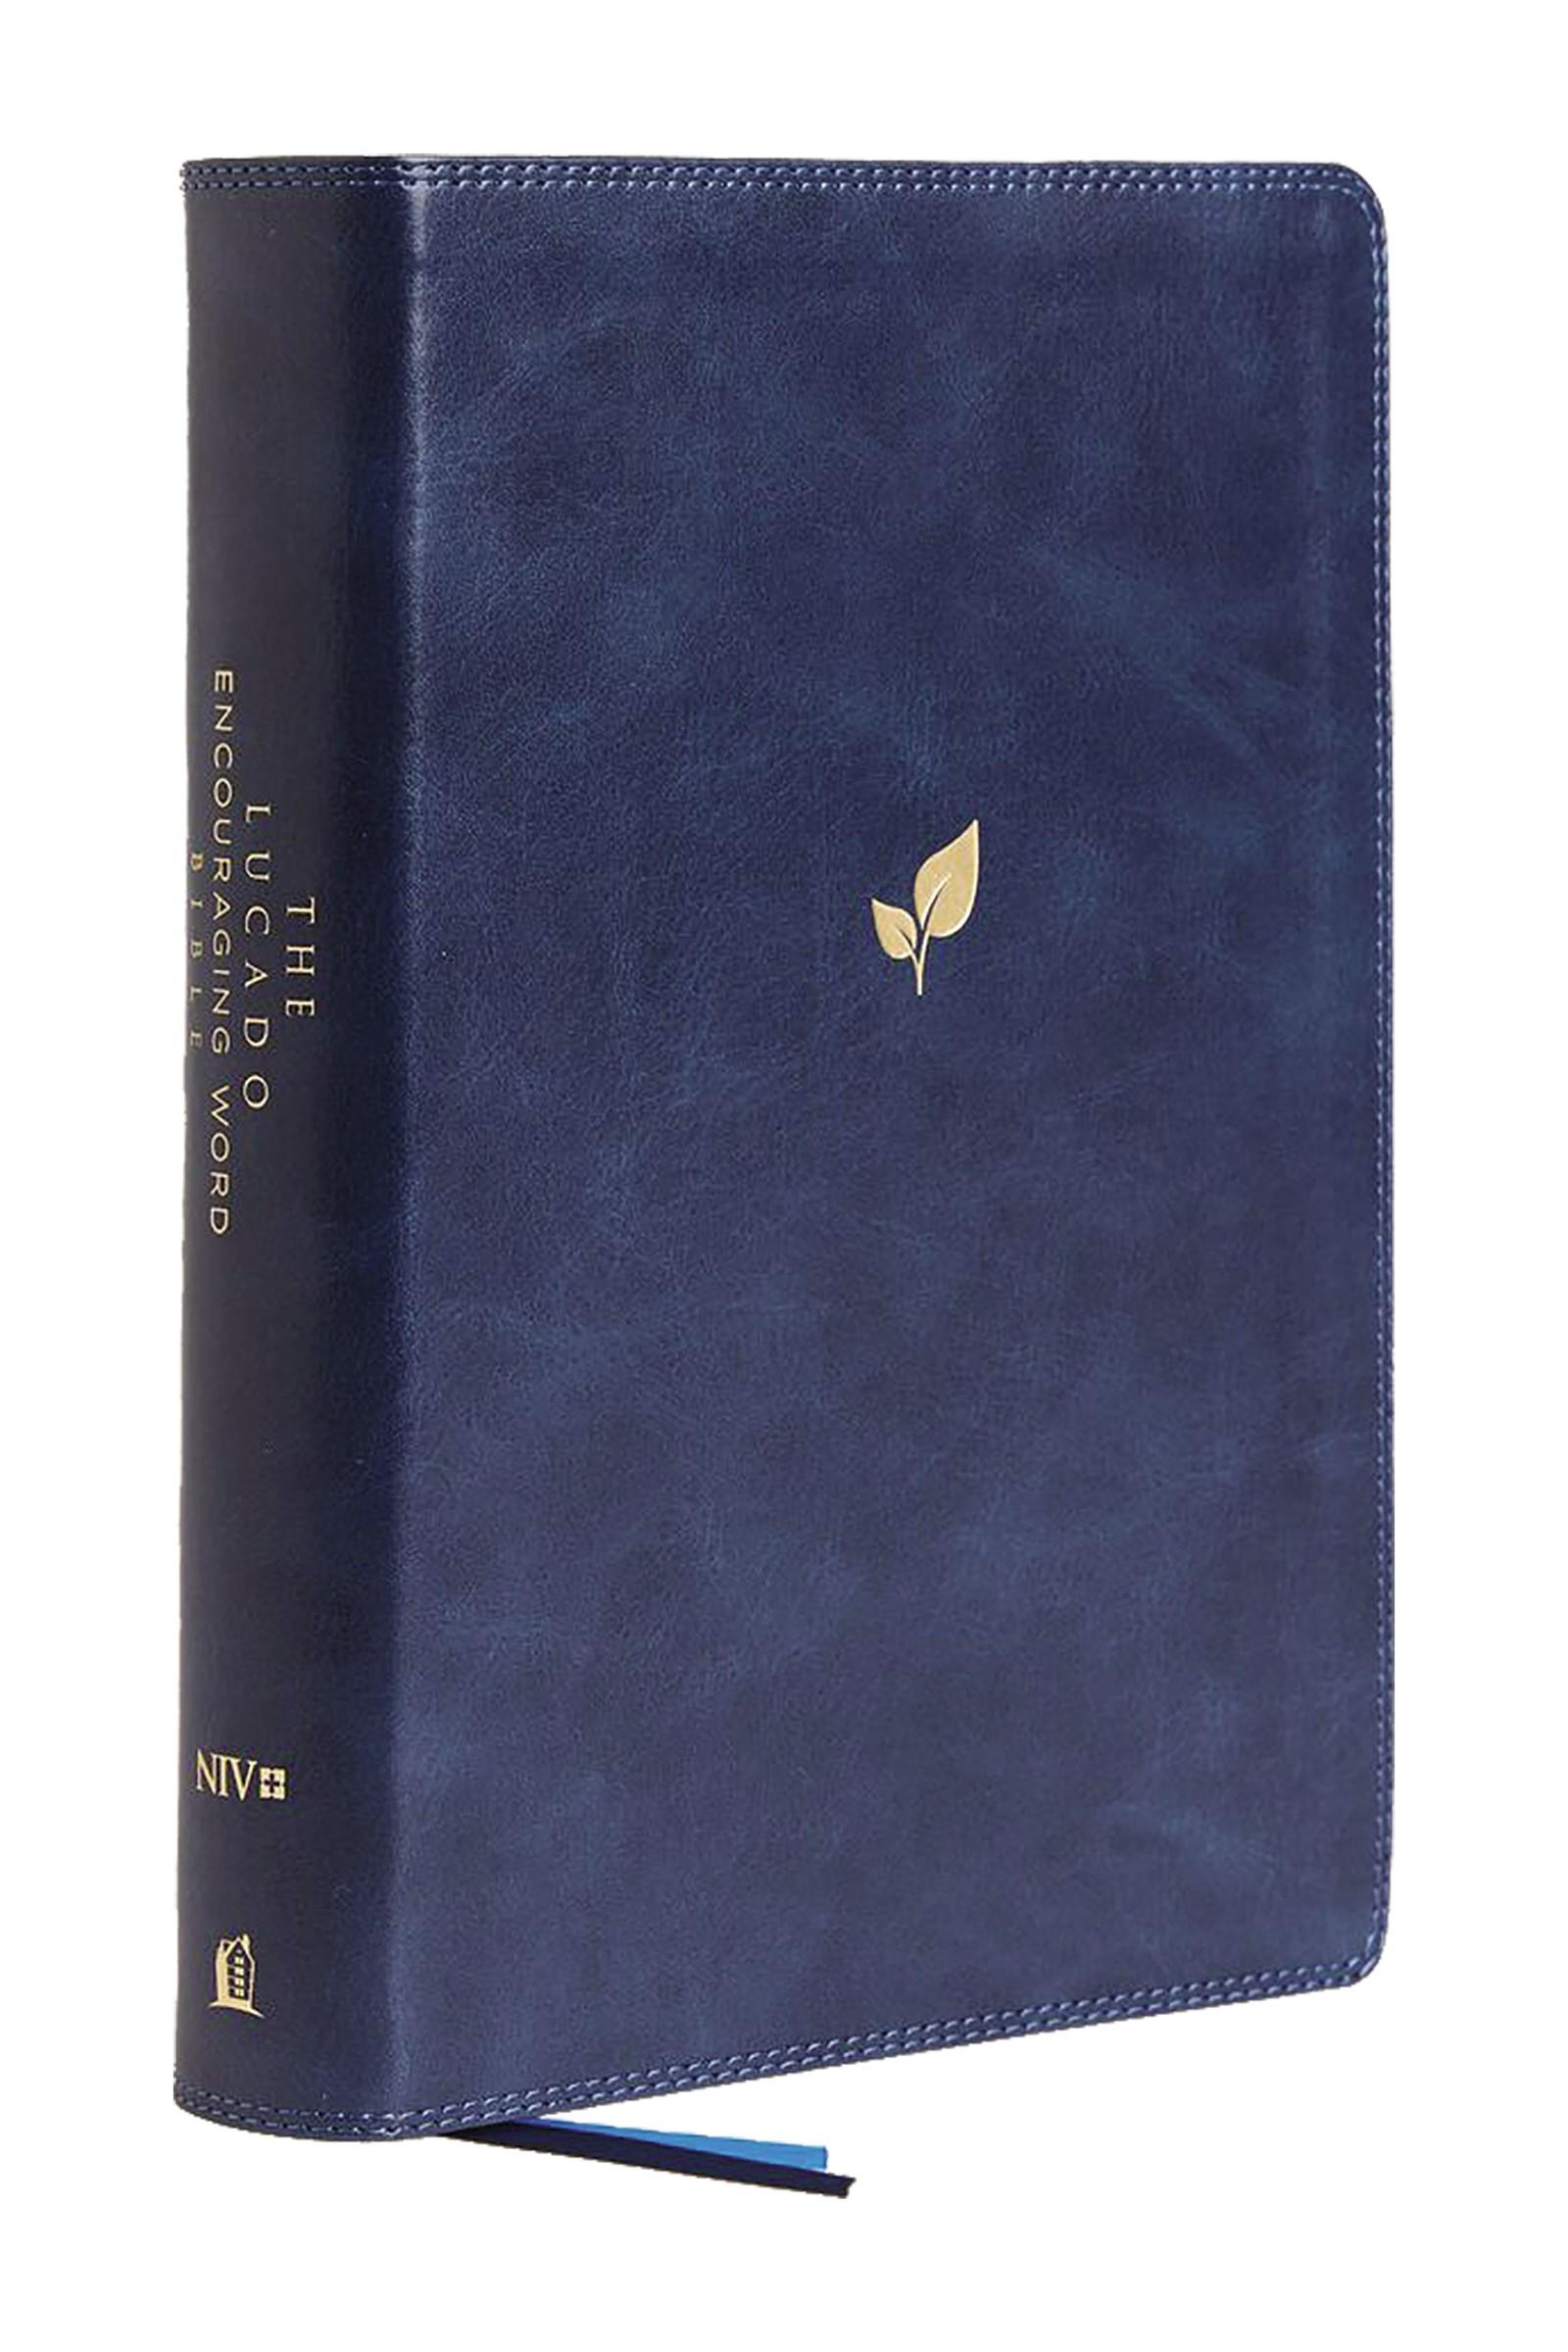 NIV Lucado Encouraging Word Bible (Comfort Print)-Blue Leathersoft